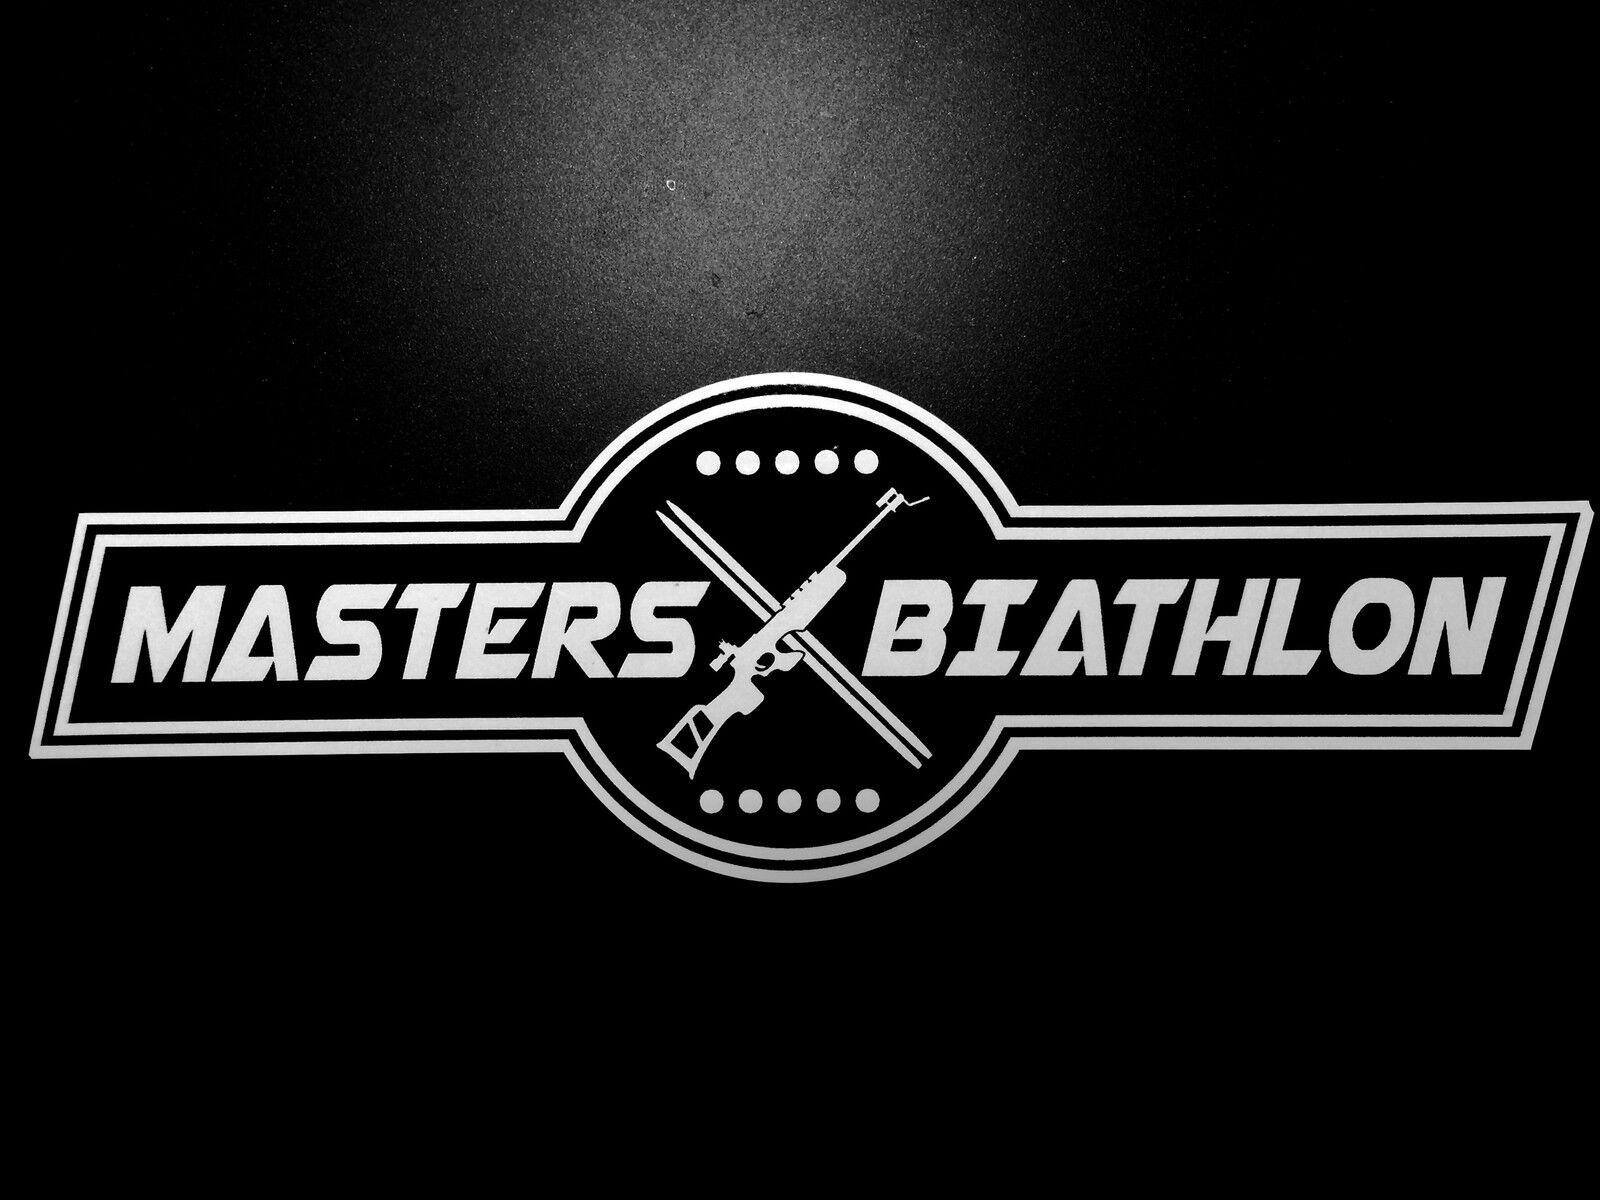 biathlon4fun